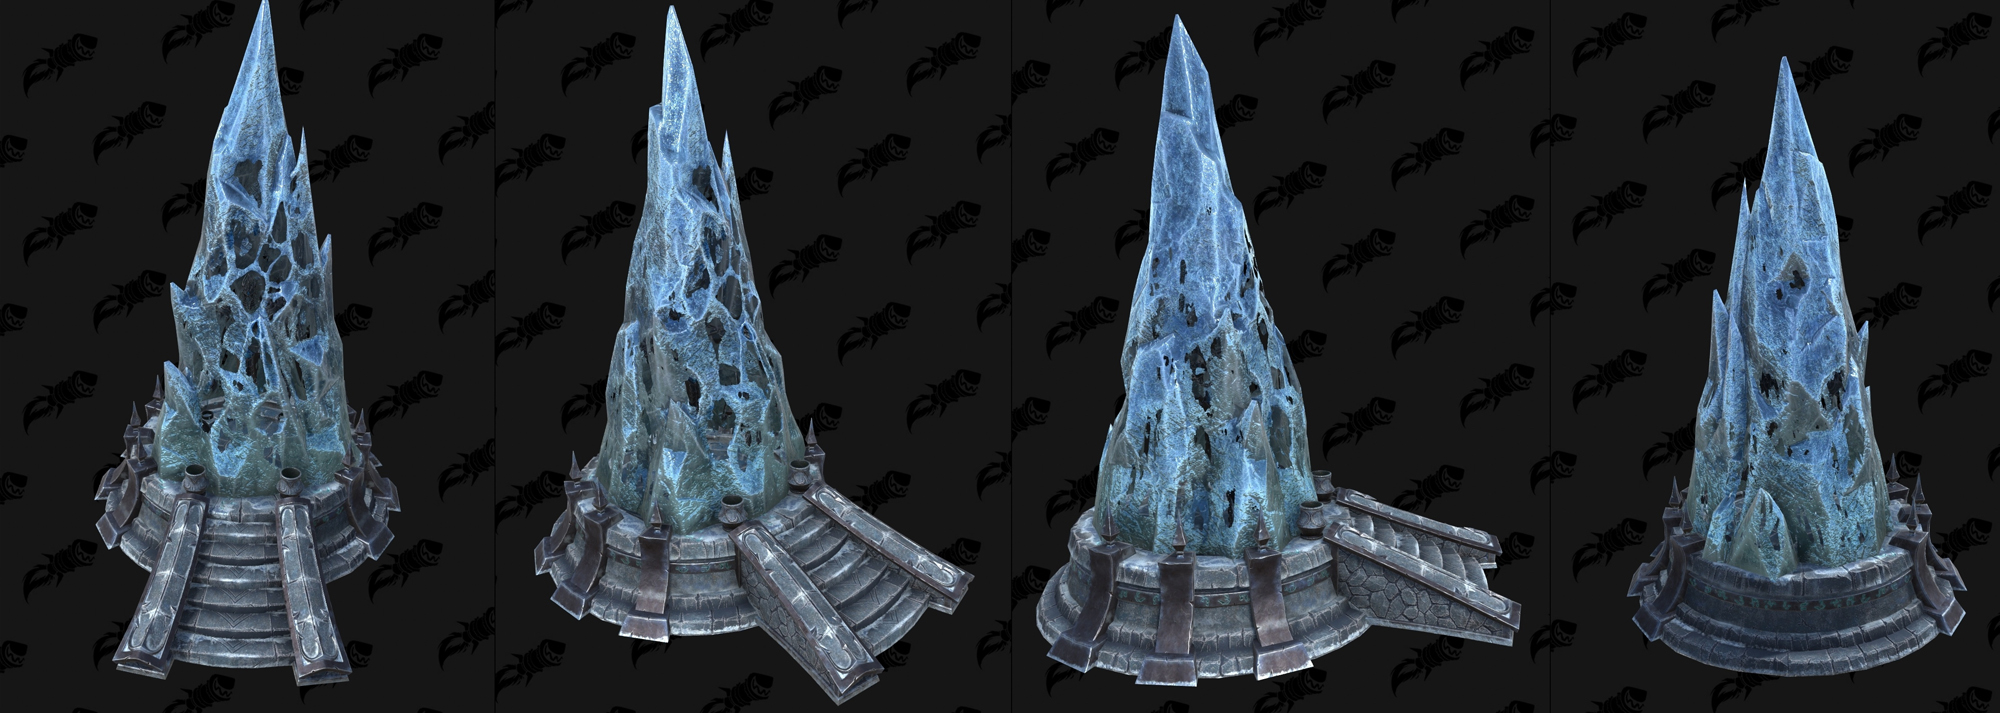 Modèle Warcraft III Reforged : Roi Liche